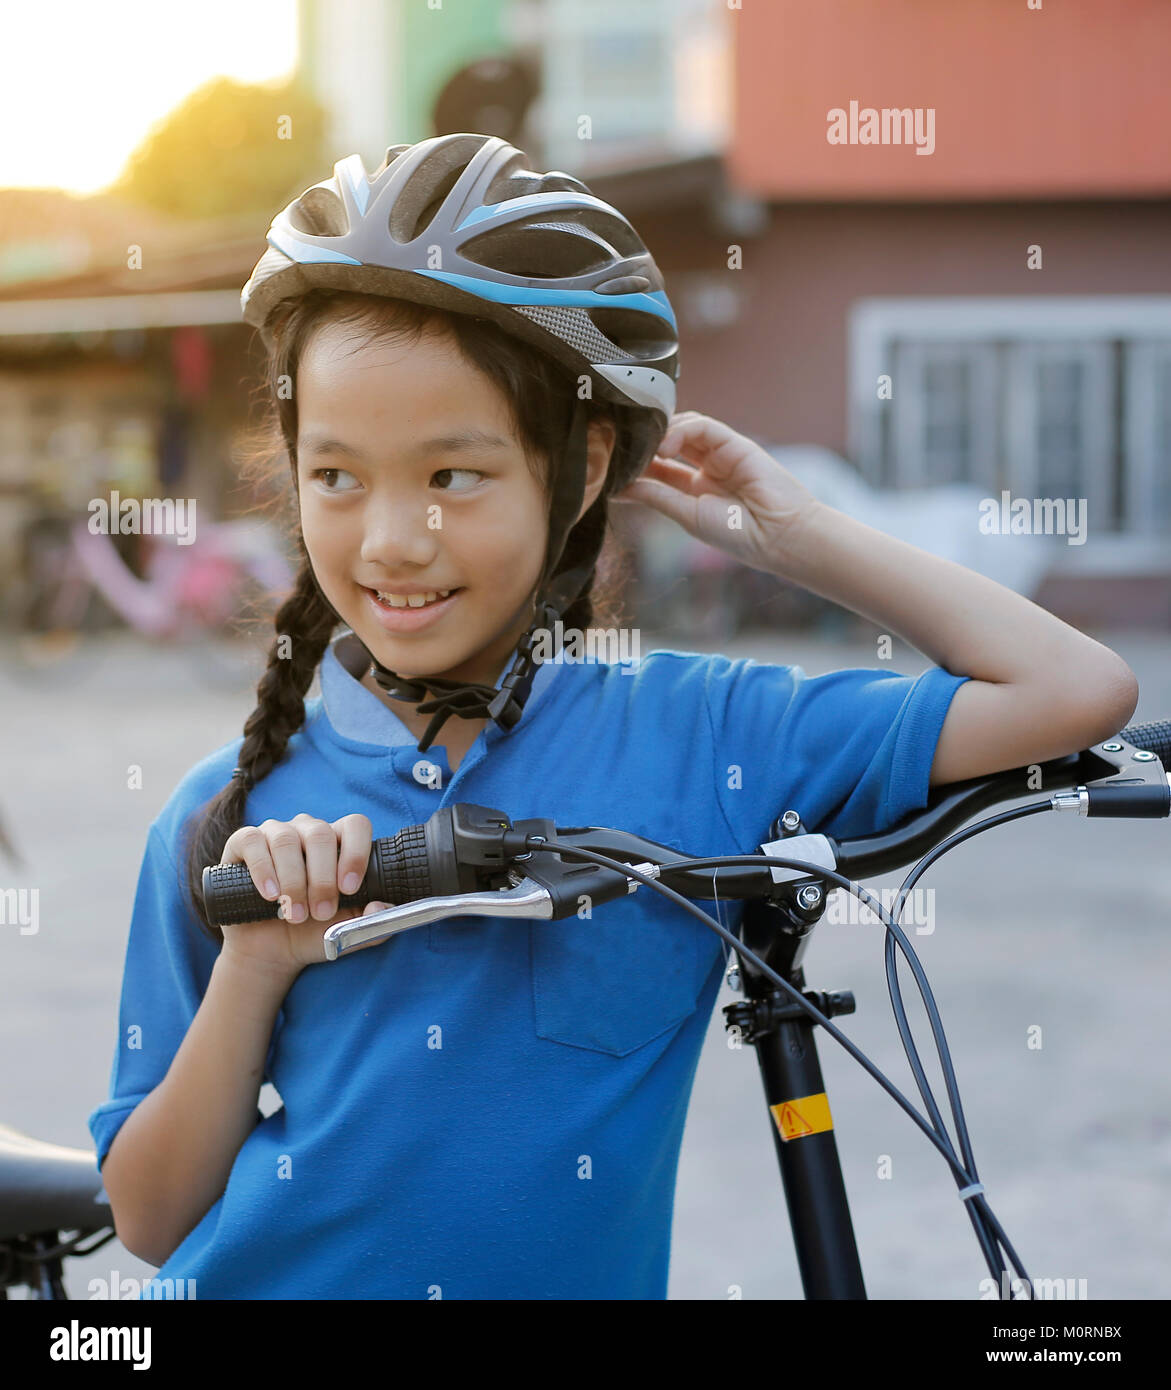 Kind, Mädchen mit Faltrad. Stockbild